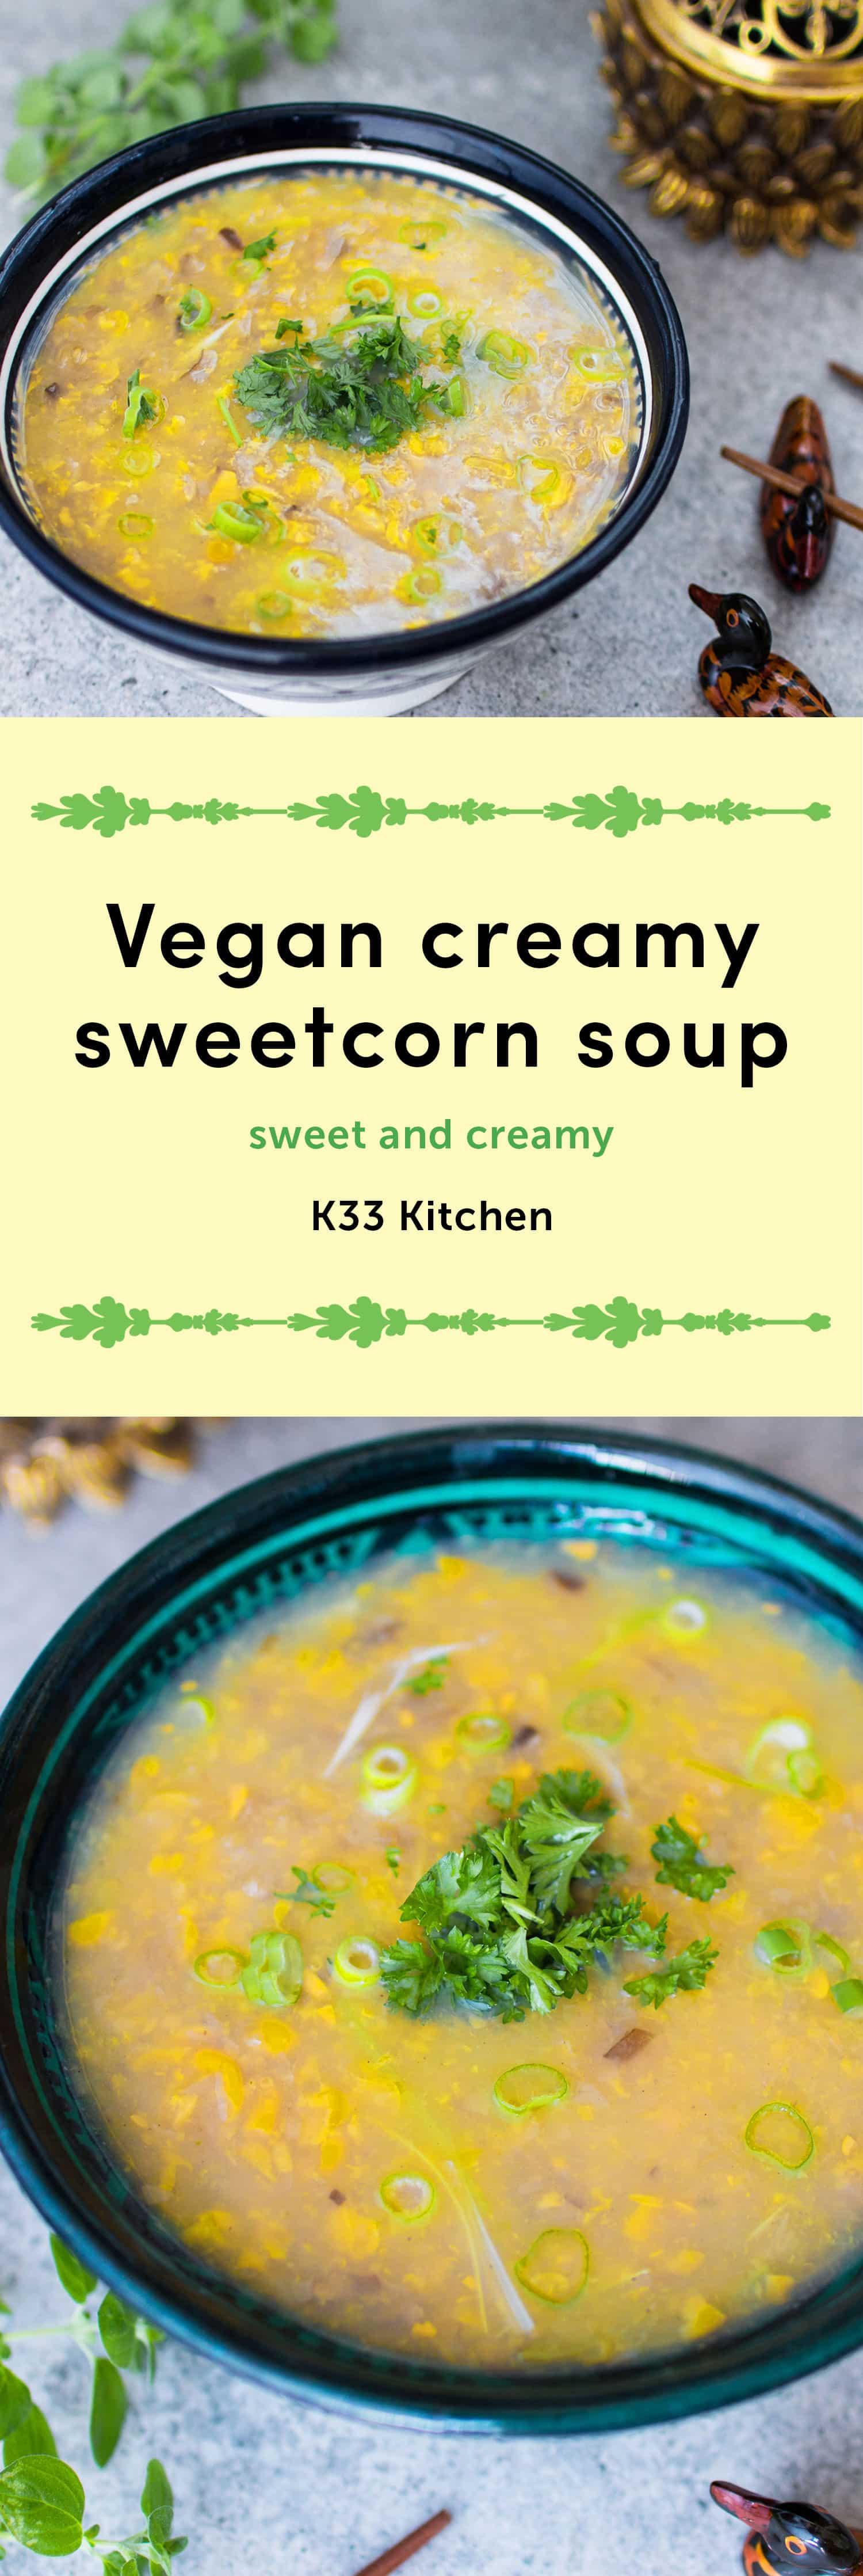 Vegan creamy sweetcorn soup